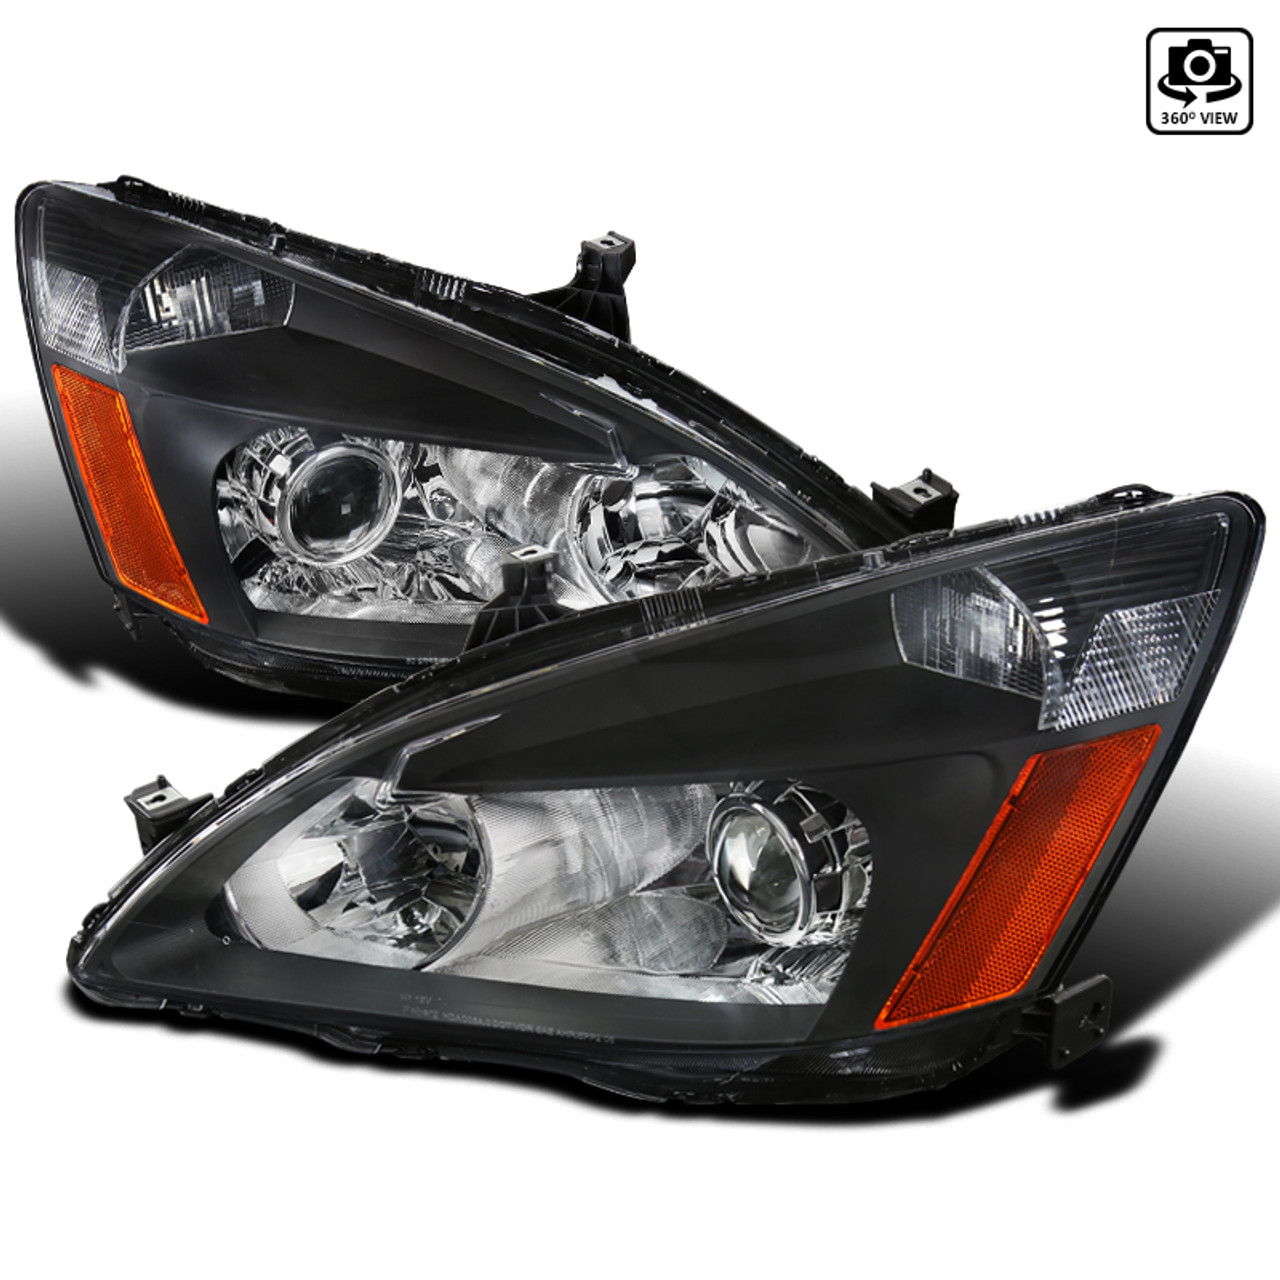 2003 2007 Honda Accord Dual Halo Projector Headlights W Amber Reflectors Matte Black Housing Clear Lens Spec D Tuning